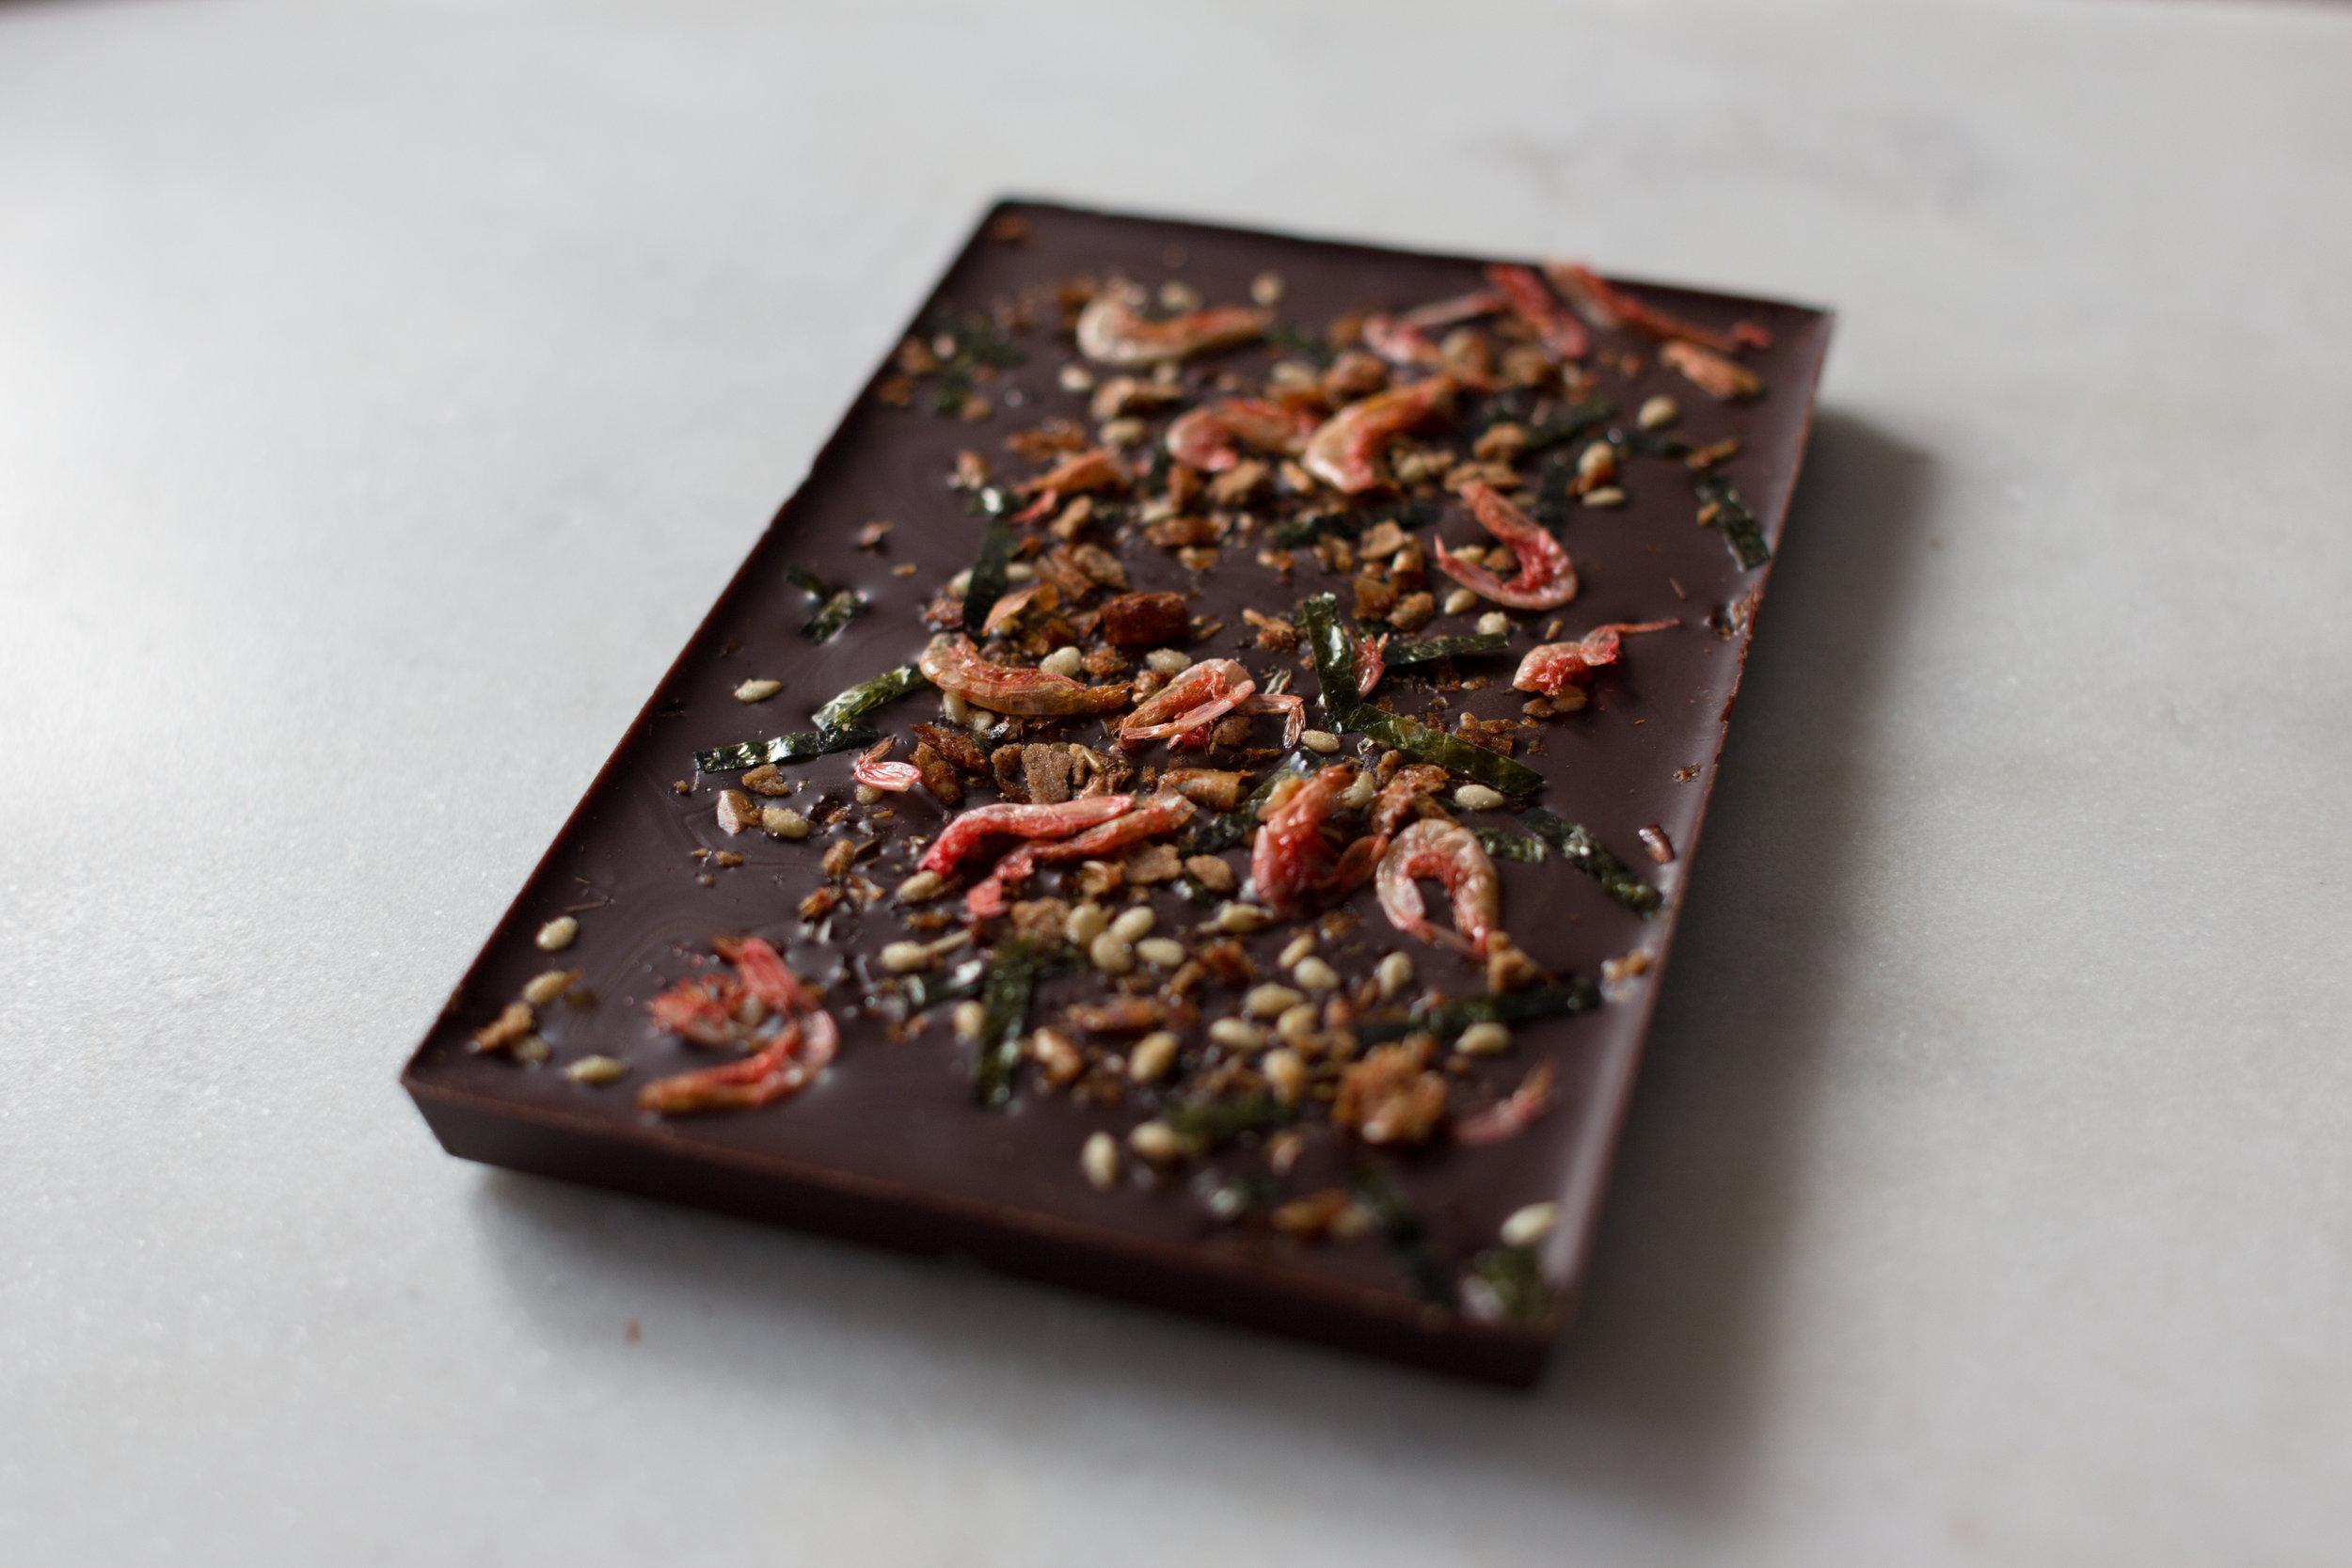 Shrimp & Bonito Chocolate Bar